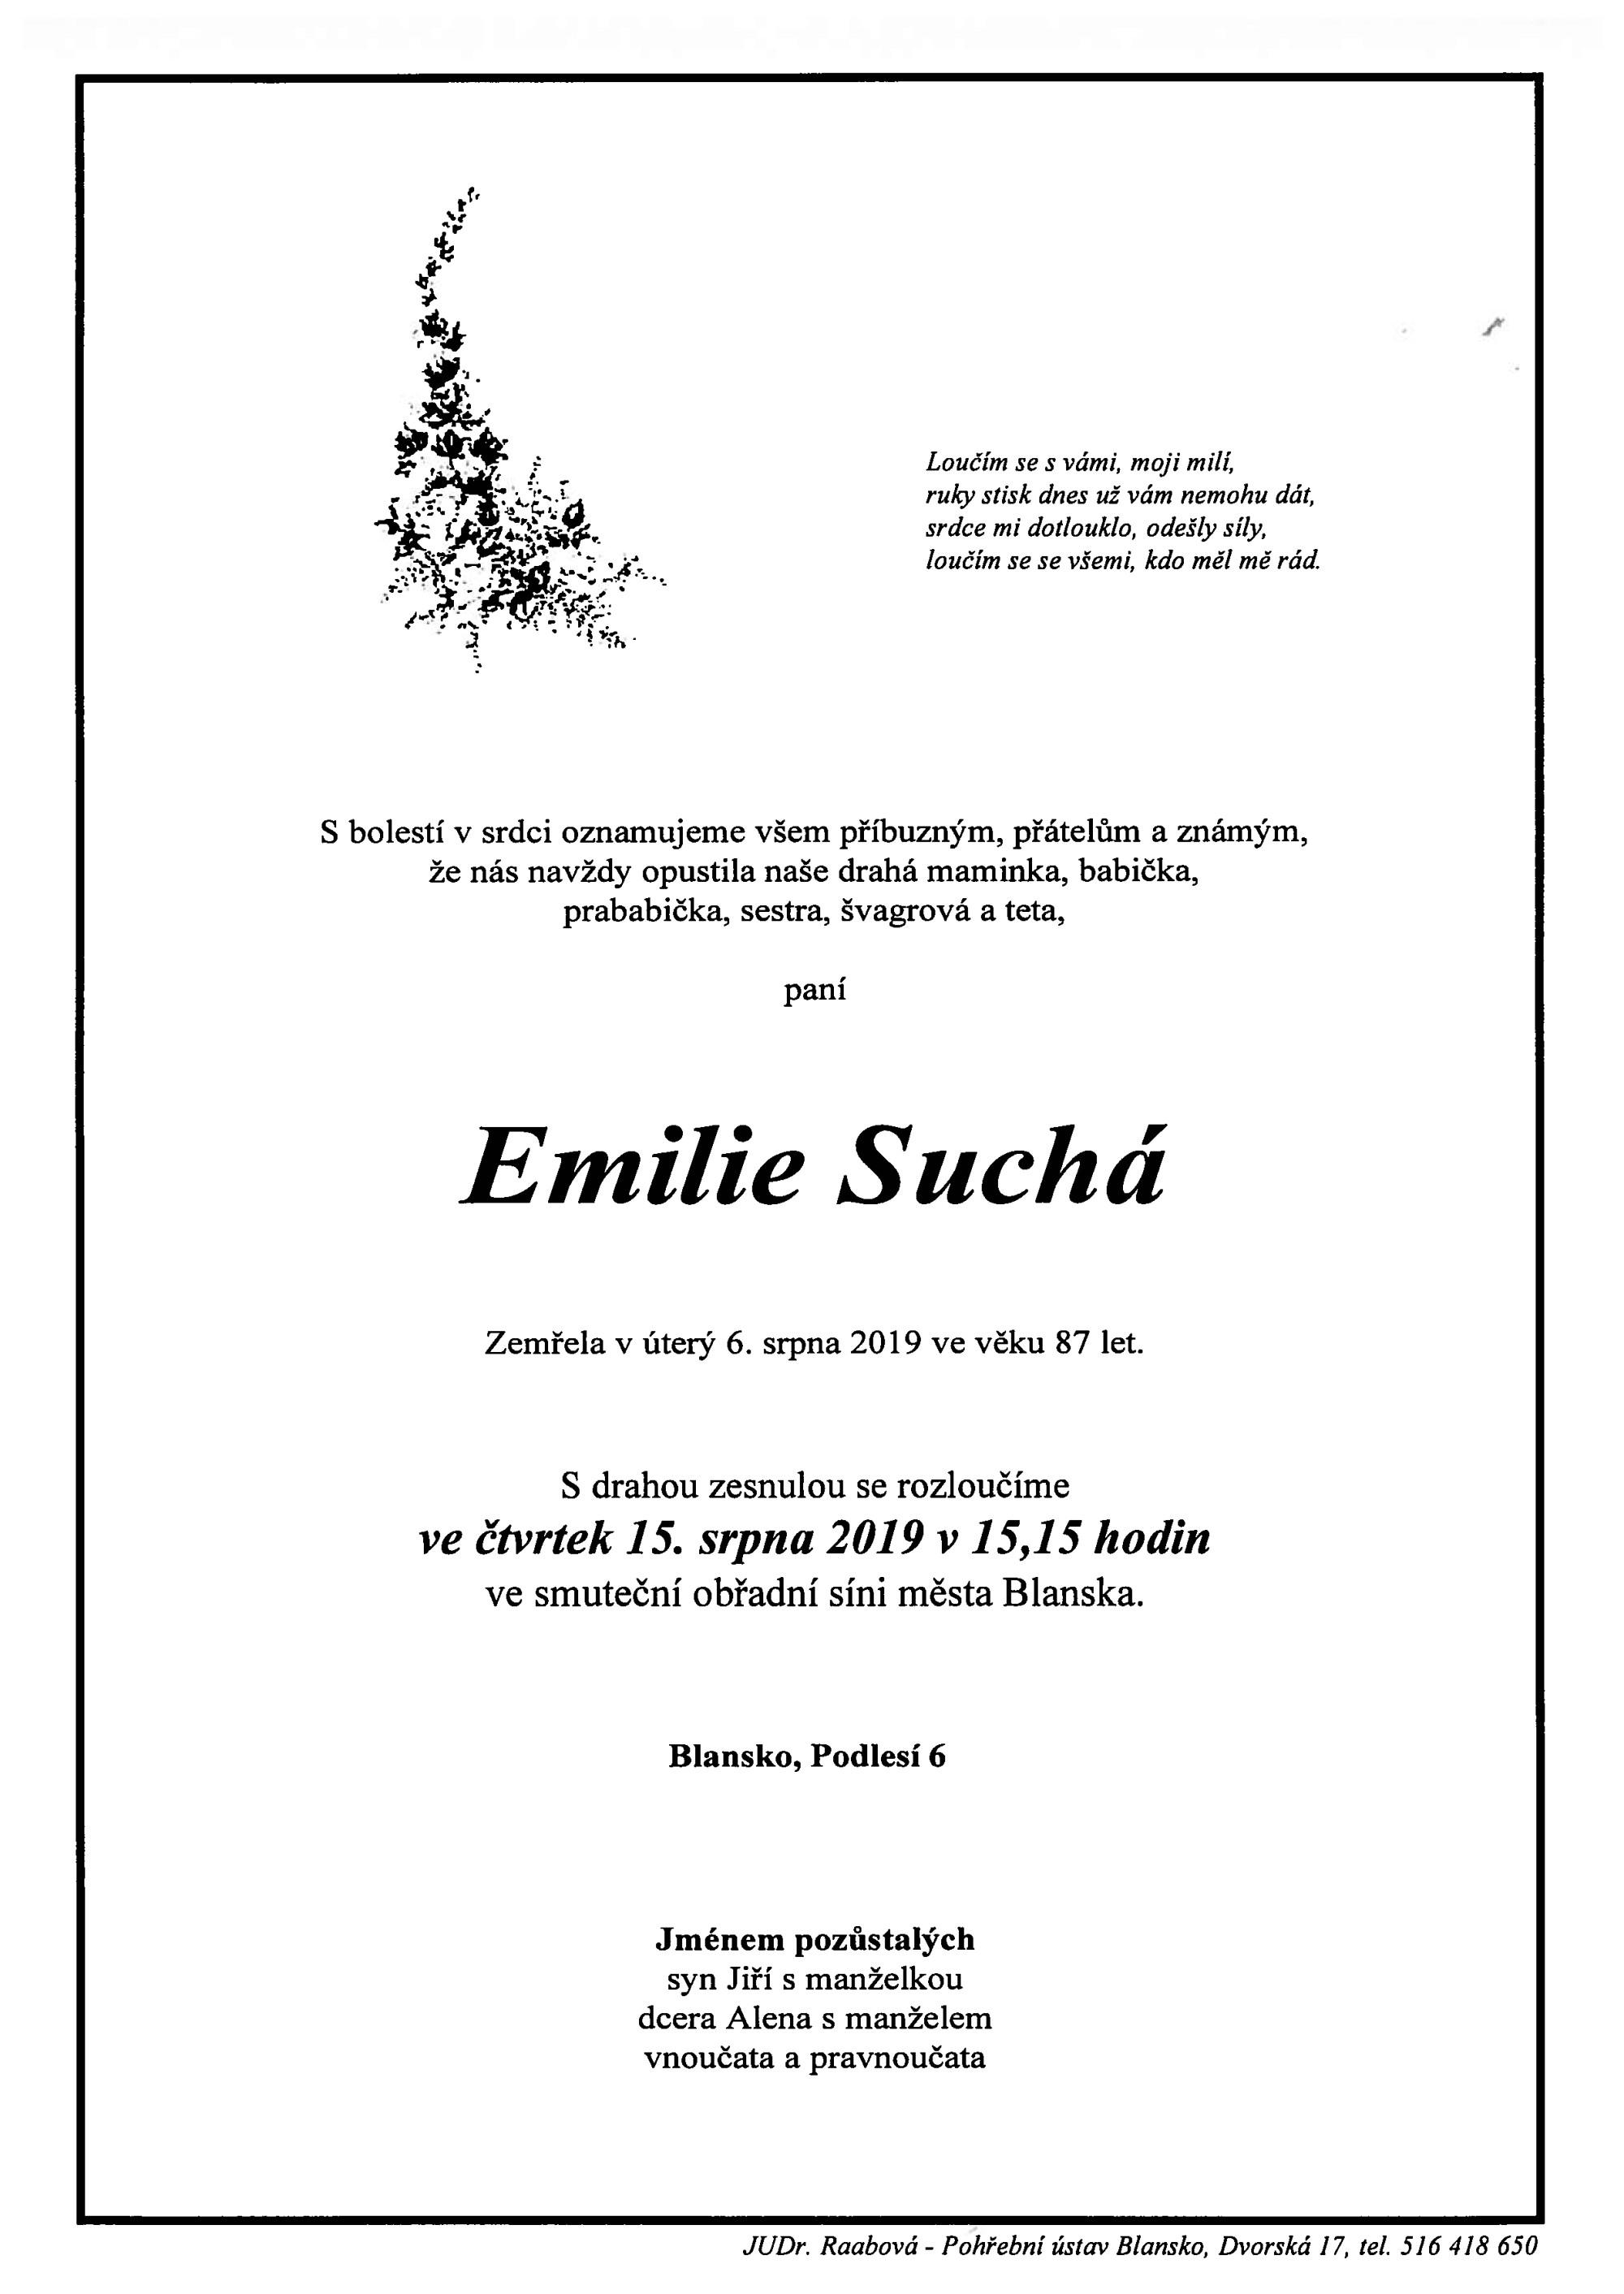 Emilie Suchá